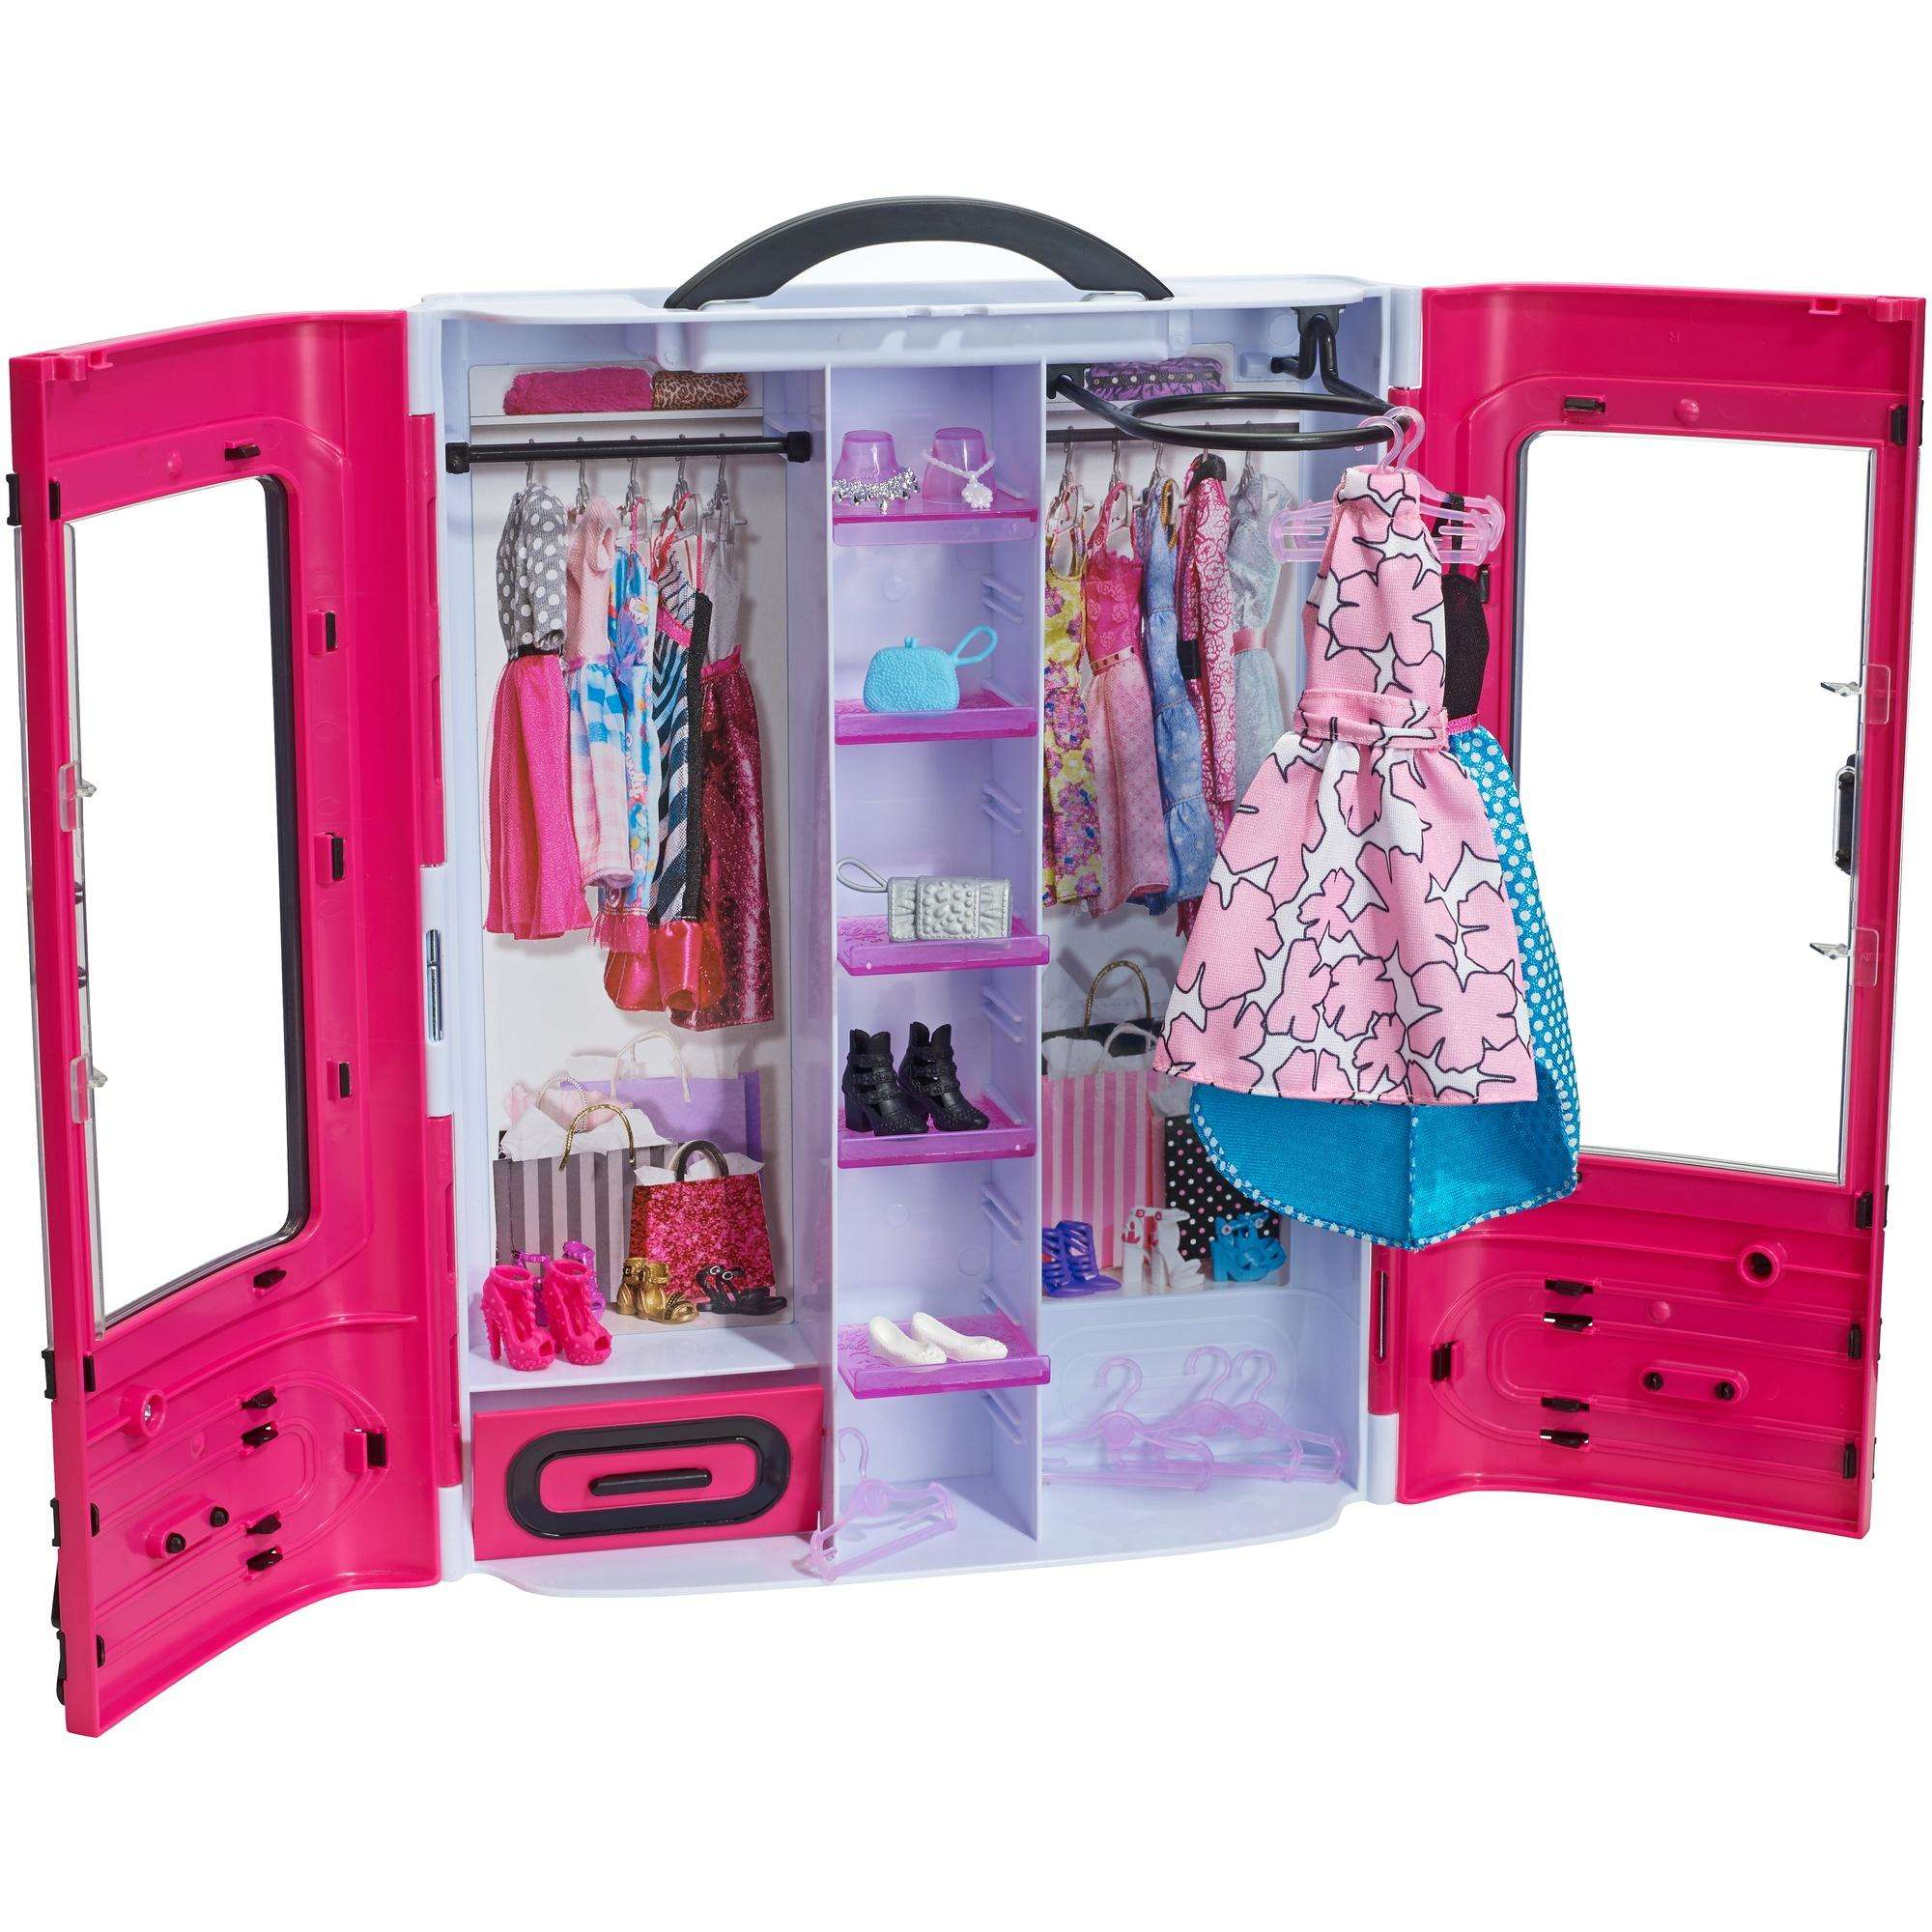 Barbie Fashionistas Ultimate Closet, Pink by MATTEL INC.